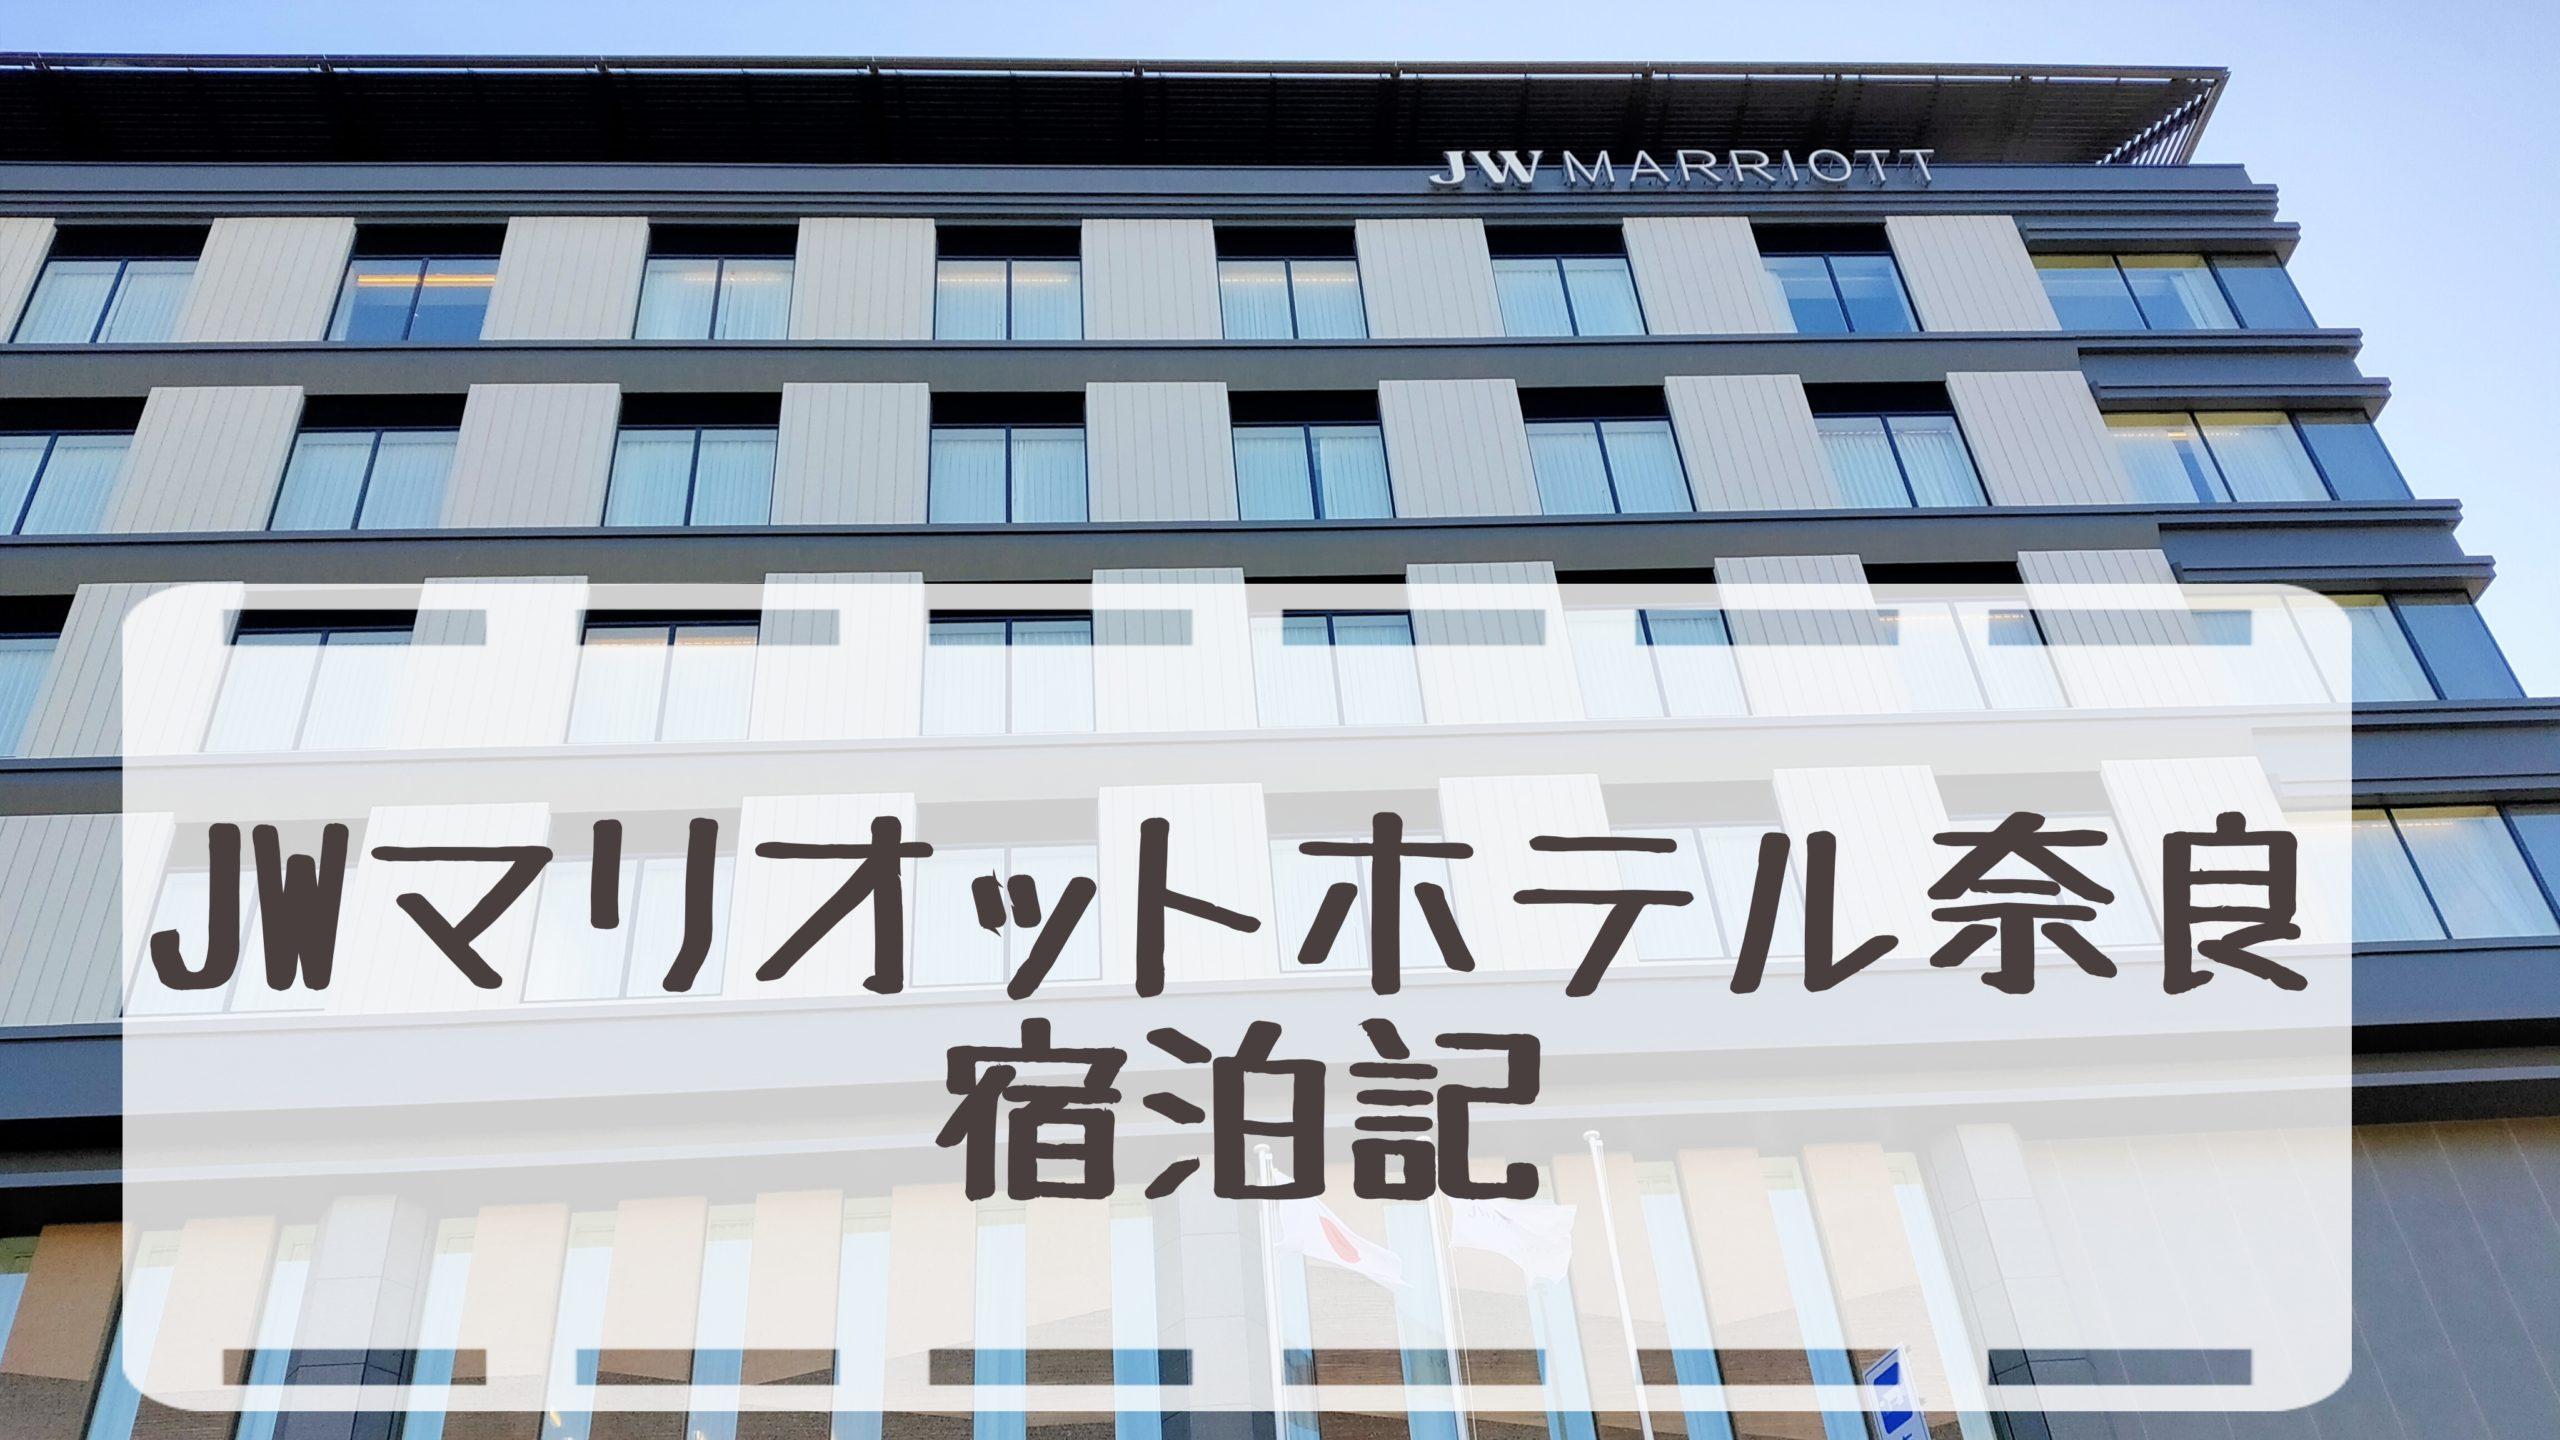 JWマリオットホテル奈良宿泊記